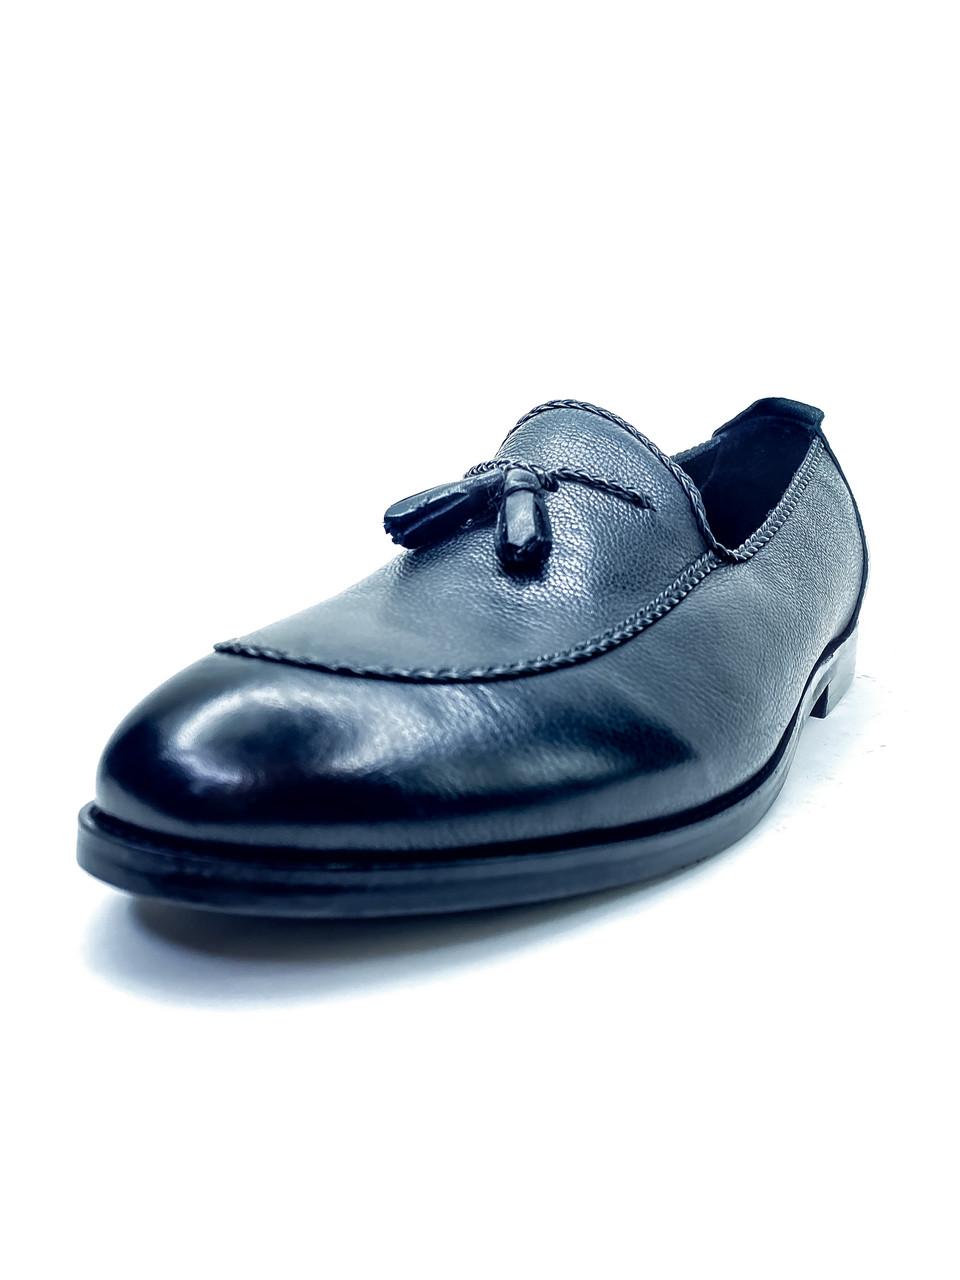 Мужские туфли - фото 5